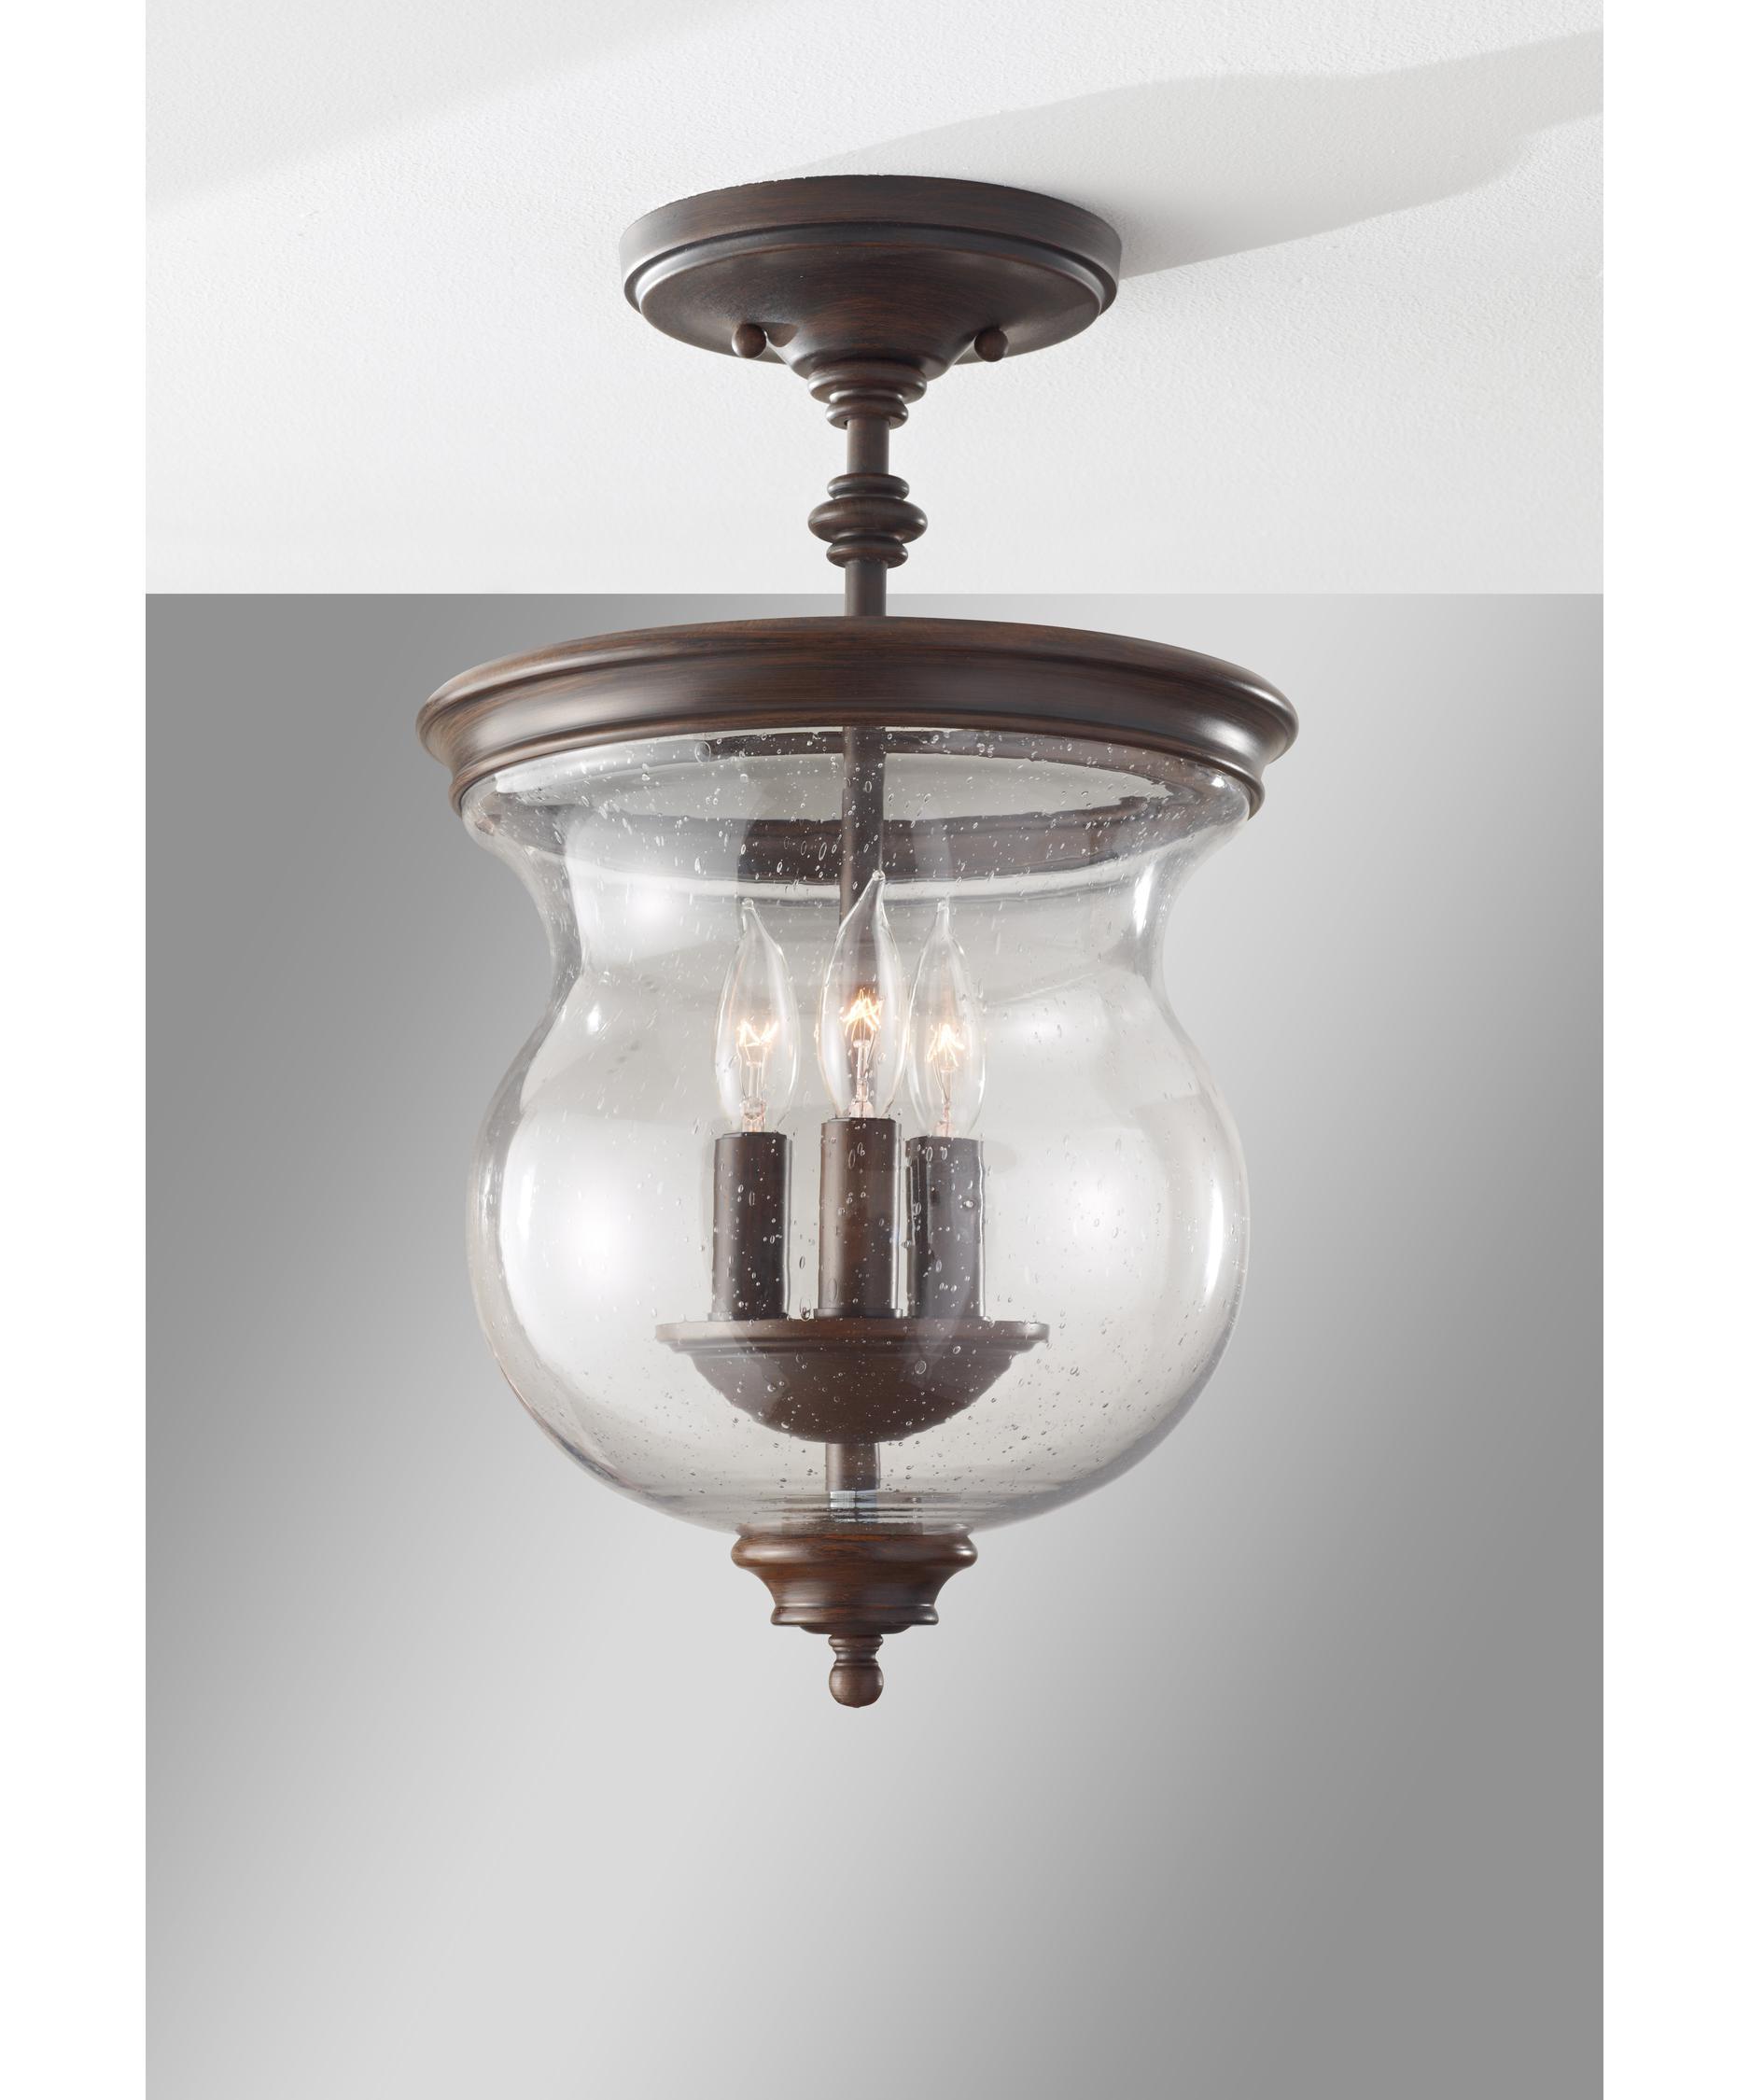 murray feiss sf309 pickering lane 10 inch wide semi flush mount capitol lighting - Feiss Lighting